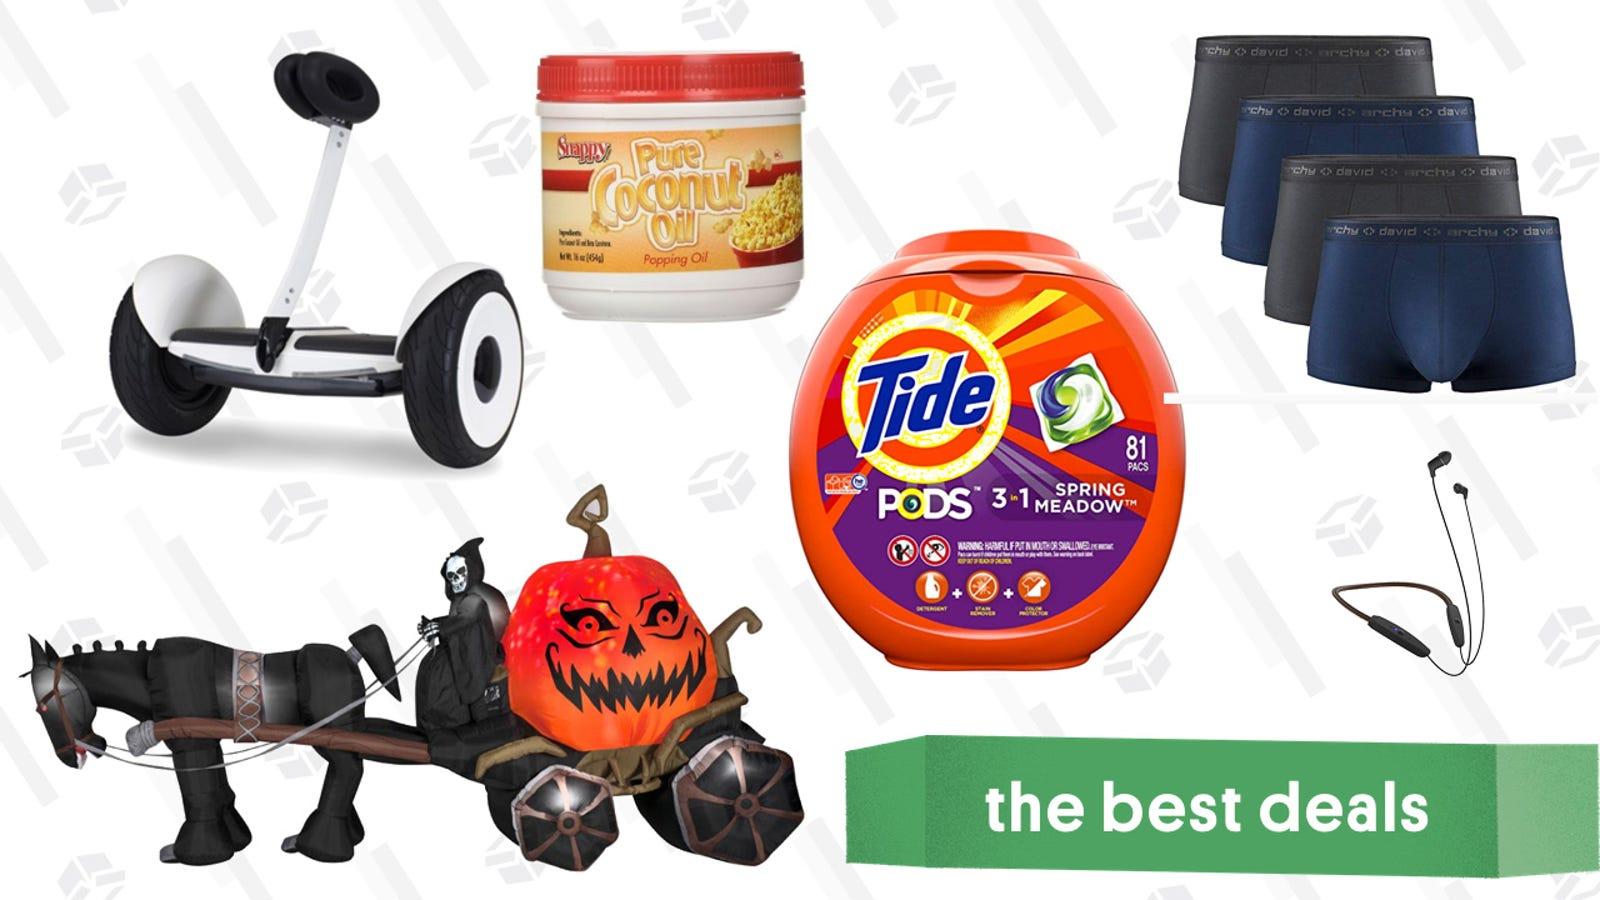 Saturday's Best Deals: David Archy Underwear, Snappy Popcorn Oil, Halloween Decor, and More